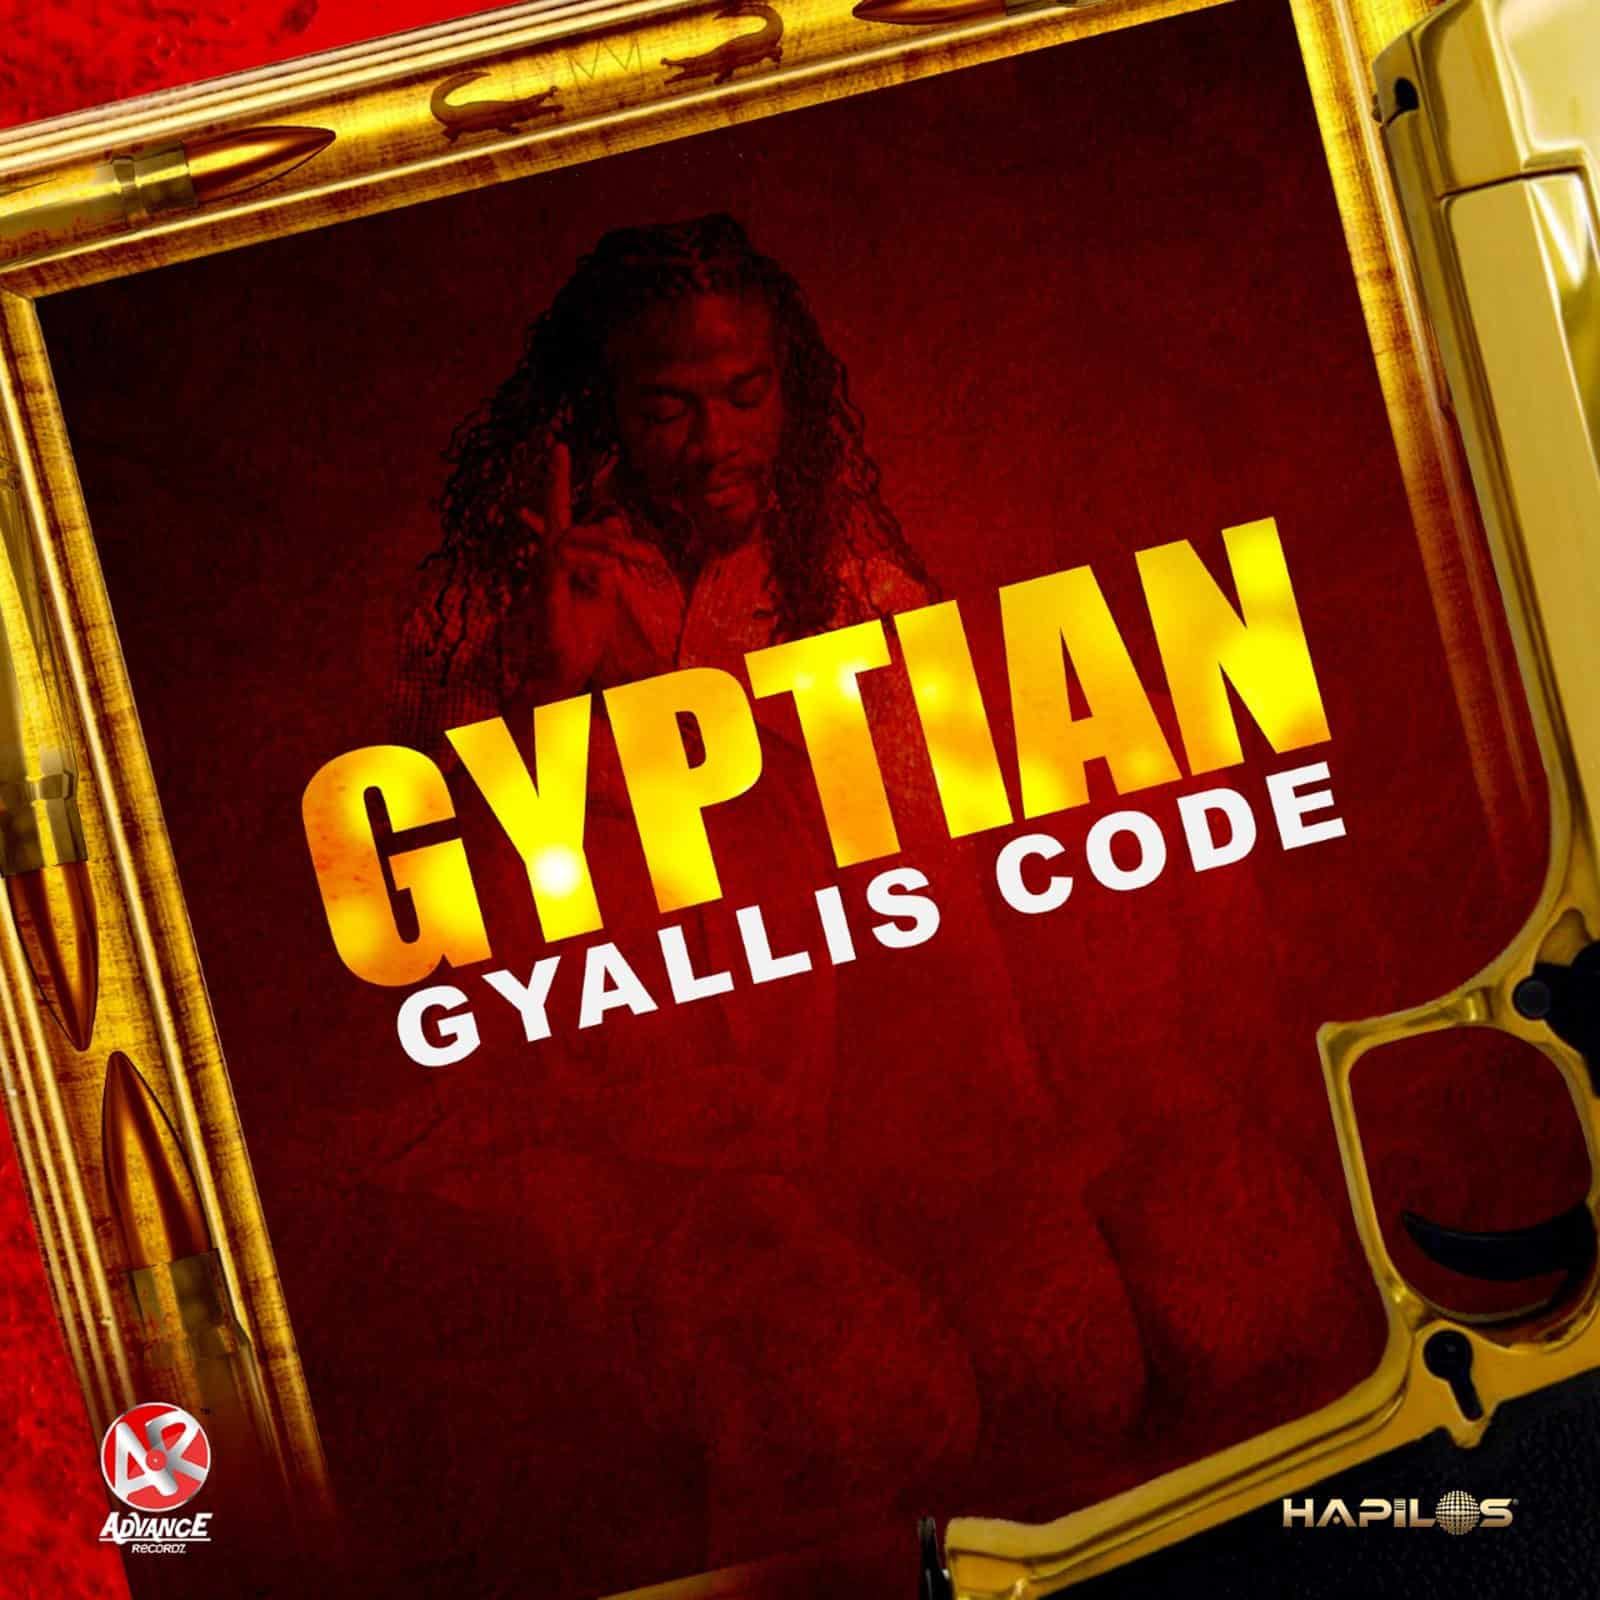 Gyptian - Gyallis Code - Advance Recordz